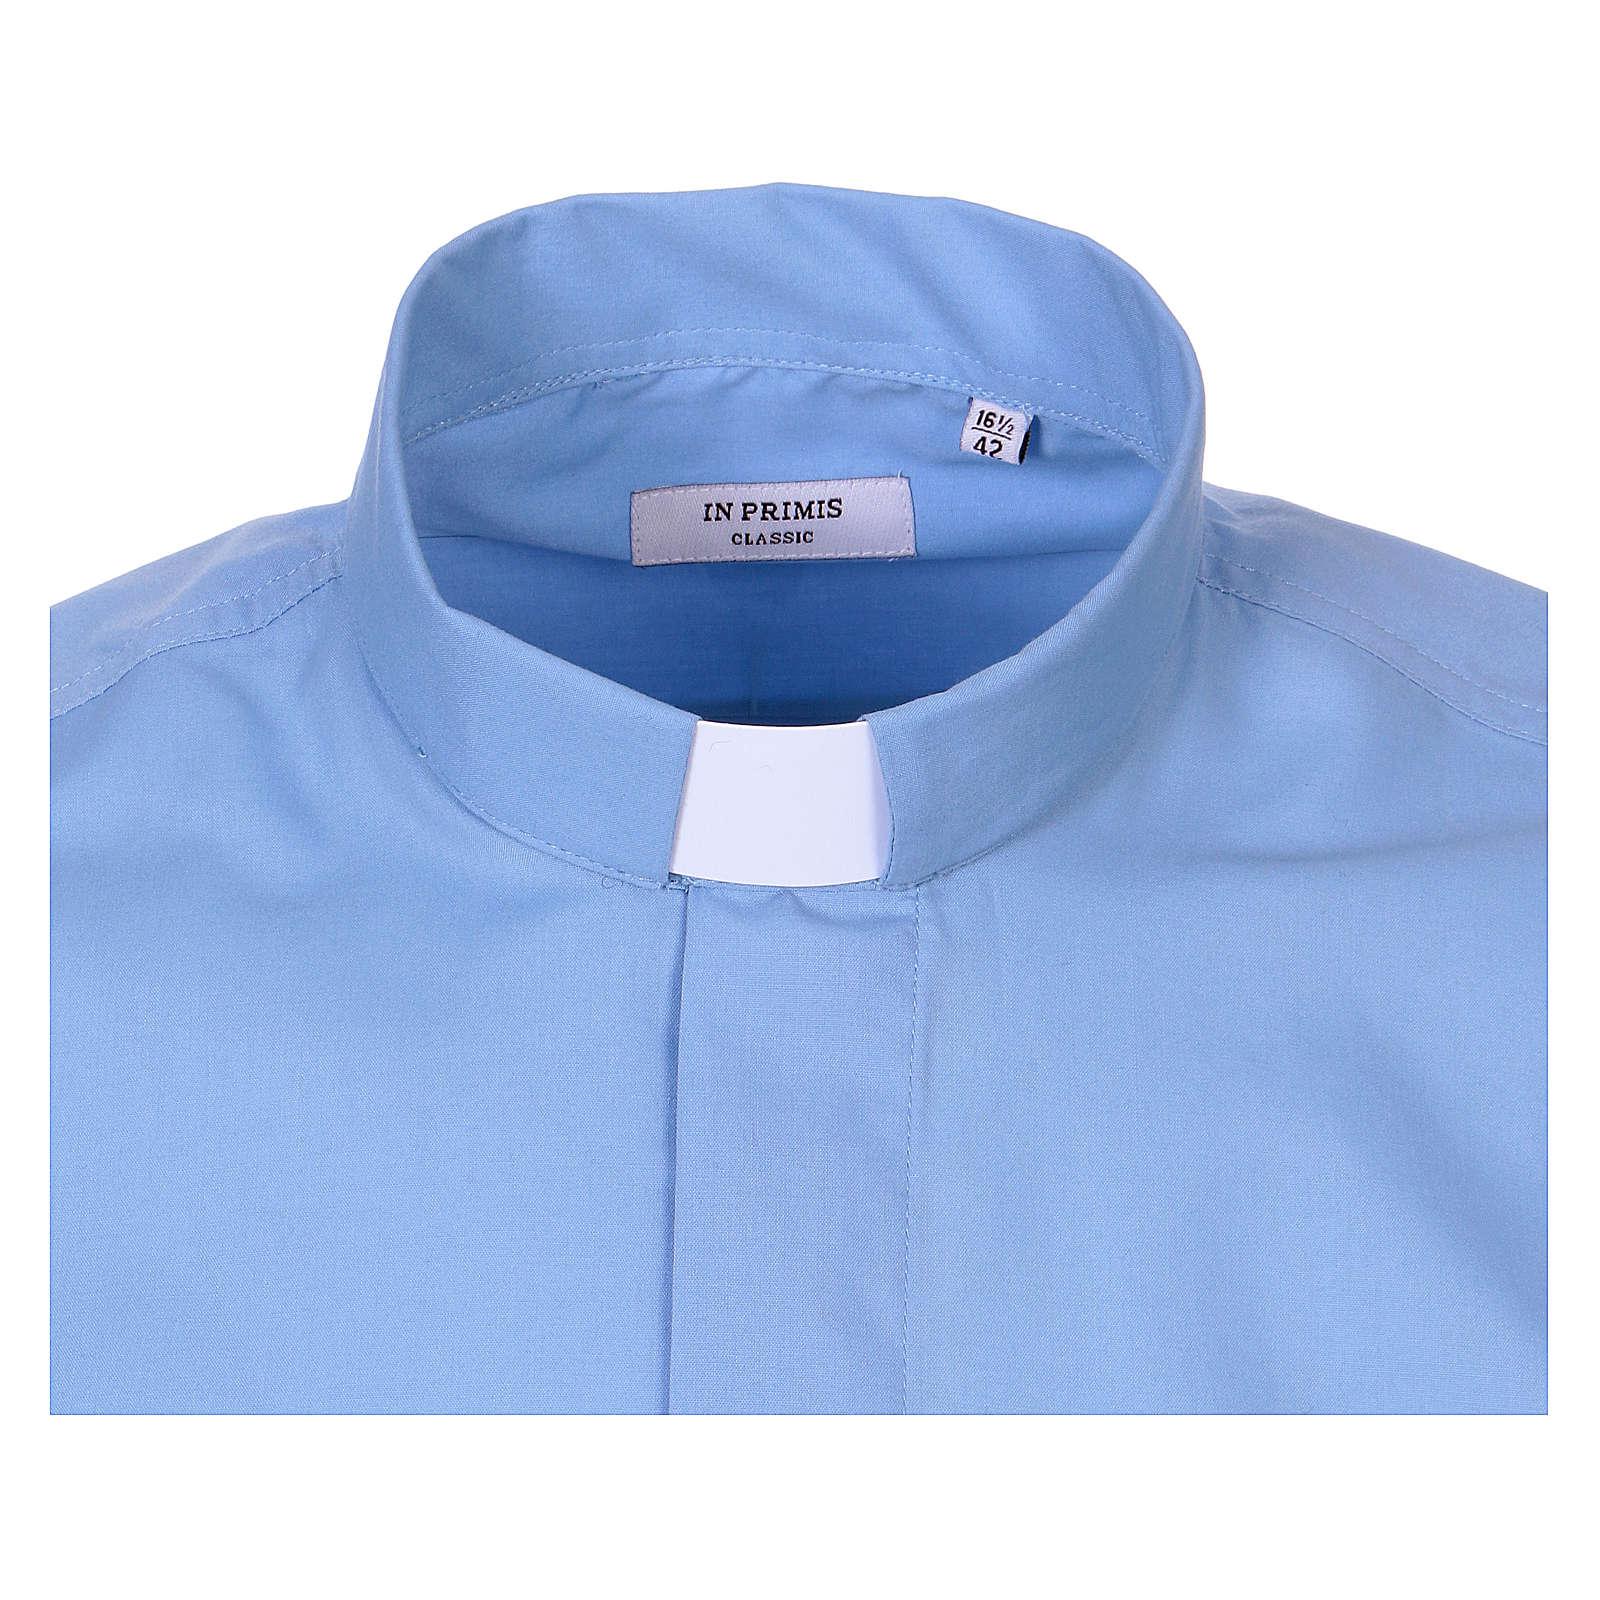 Camisa Clergyman manga longa misto algodão azul claro In Primis 4